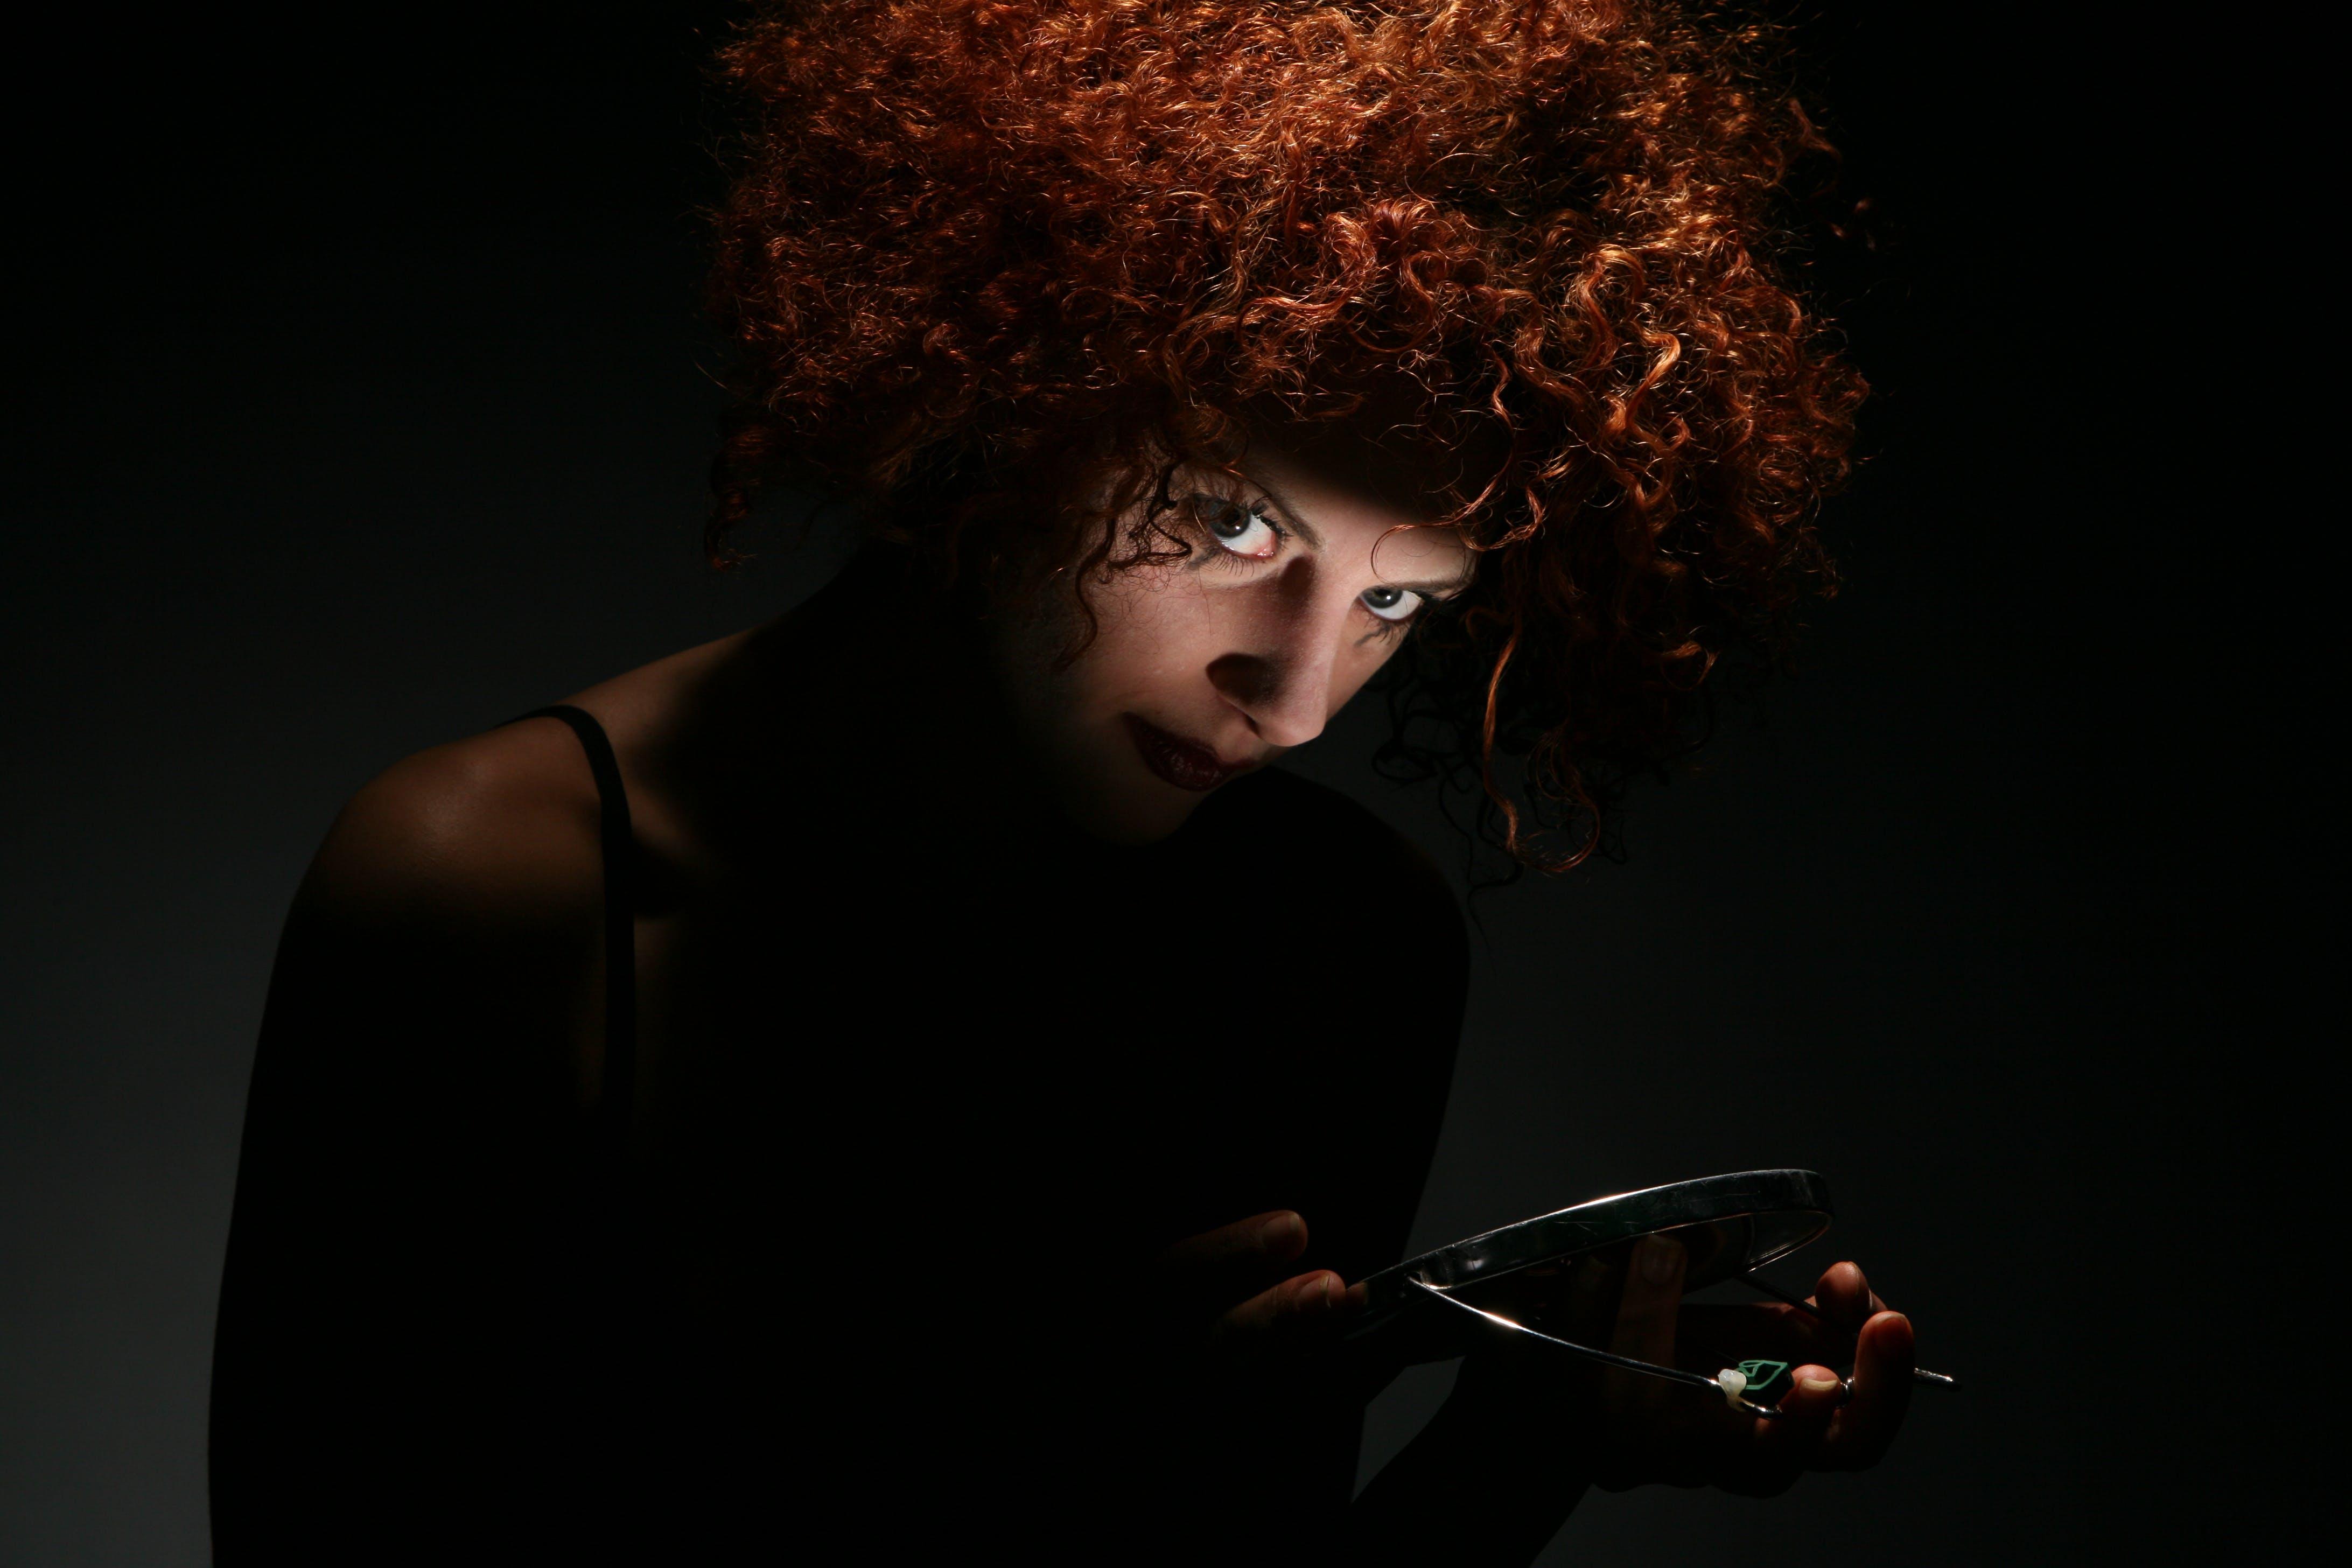 Kostenloses Stock Foto zu frau, haar, verrückt, psycho